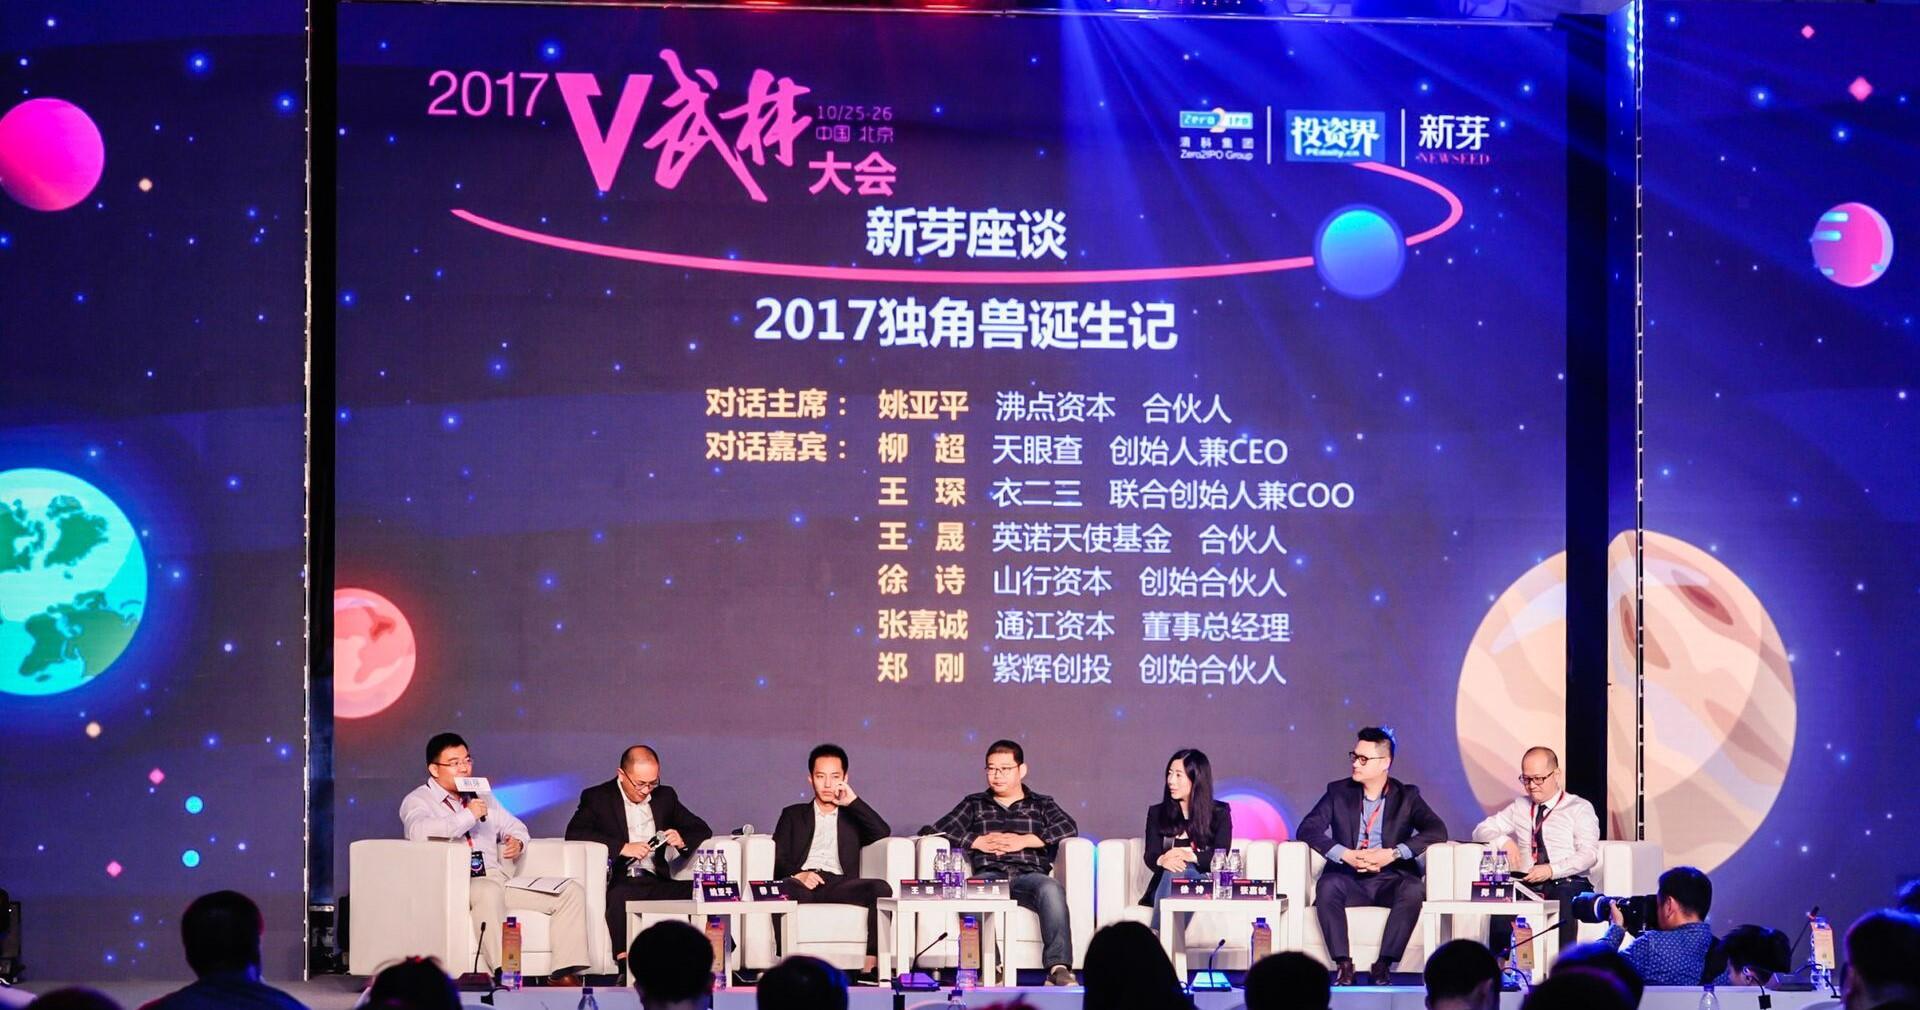 2017V武林大会落幕 资本与创新共话创业新时代